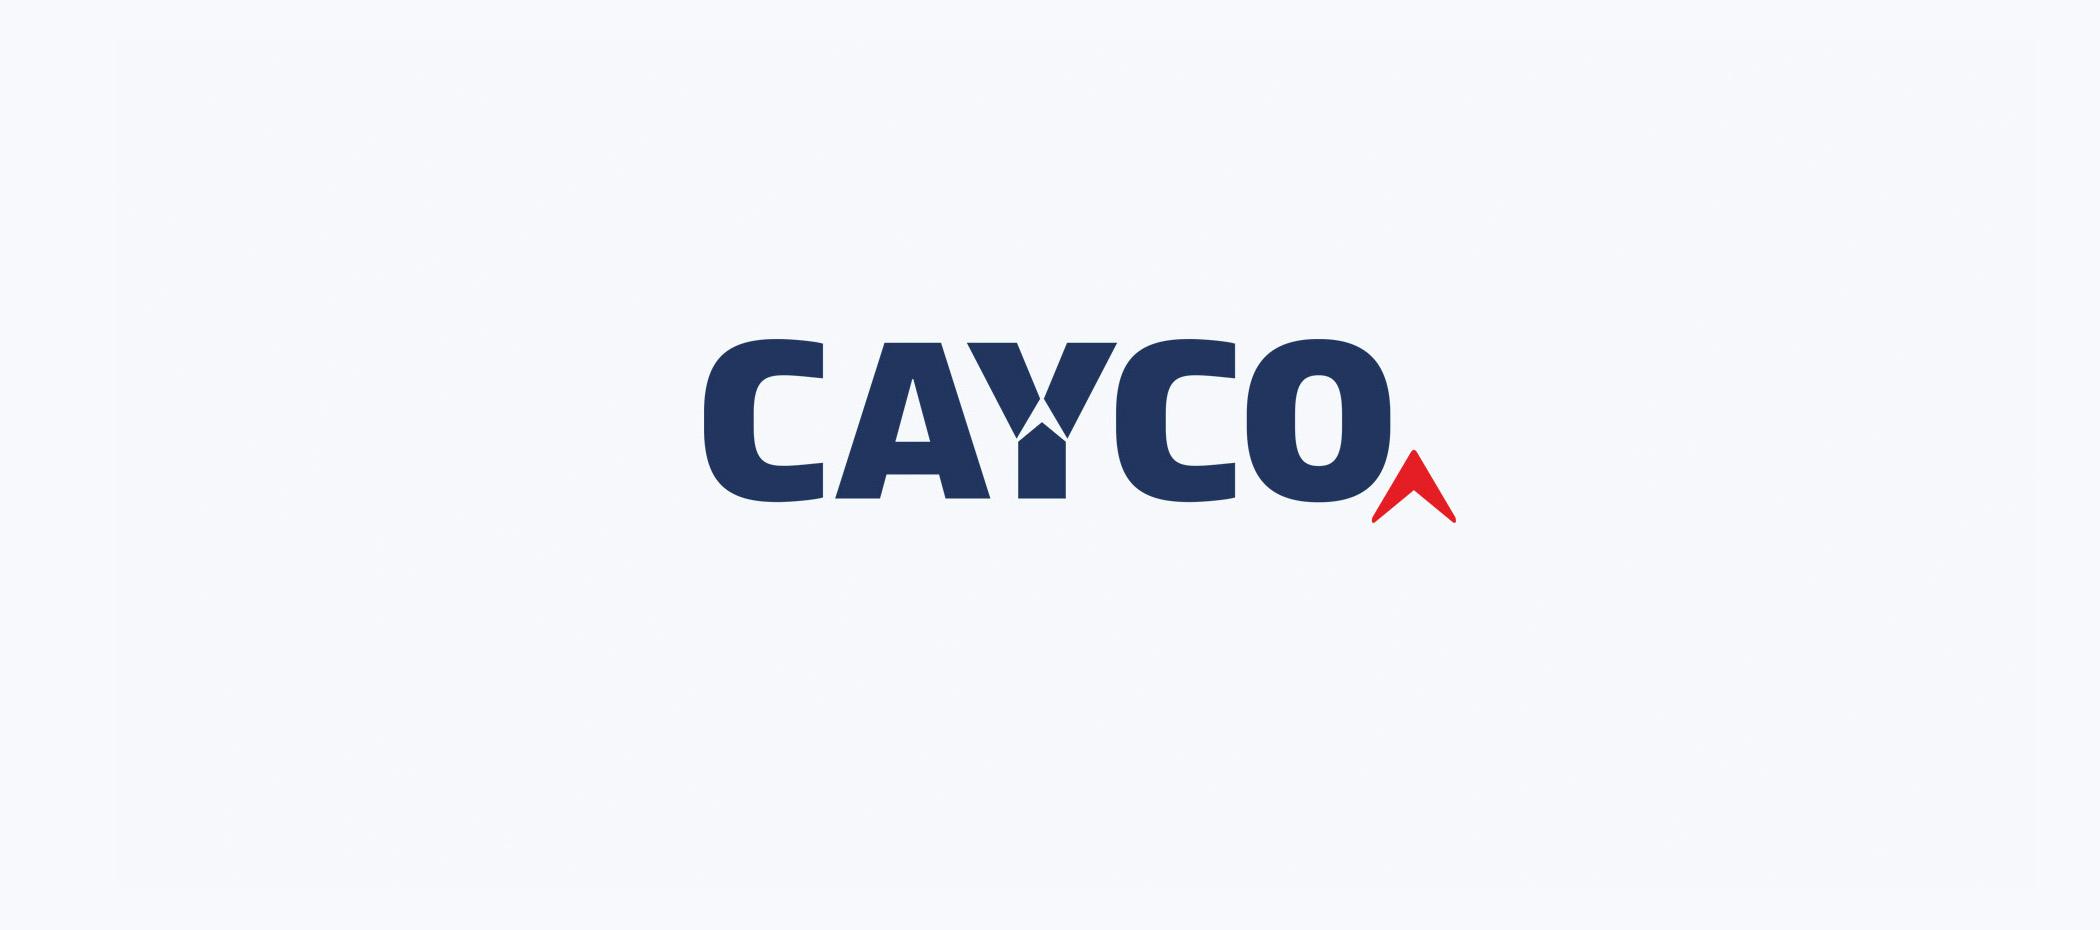 diseno logotipo - Beusual - diseno grafico santander - CAYCO logo